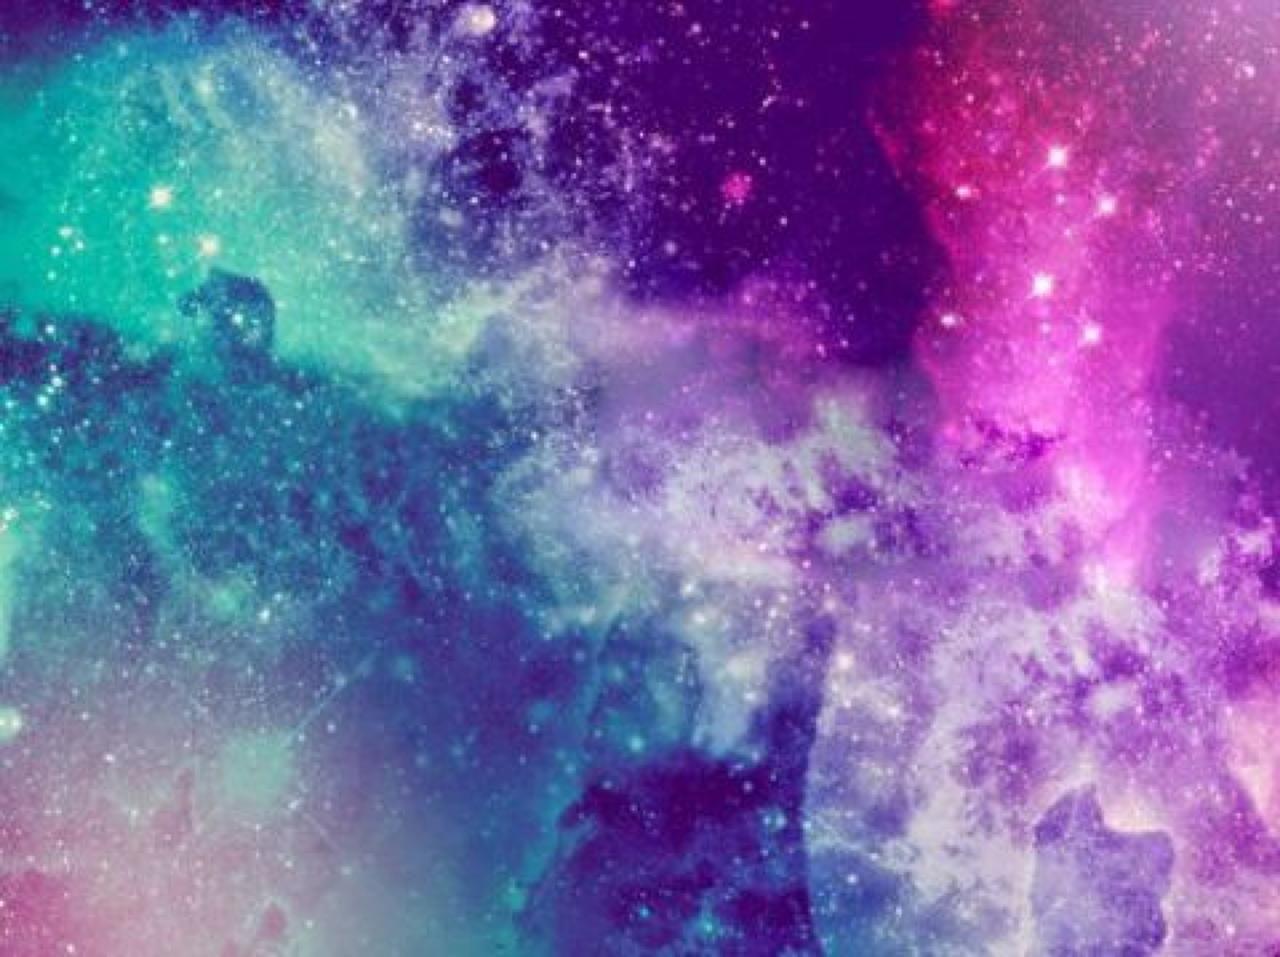 galaxy wallpapers full hd | galaxy | pinterest | purple galaxy